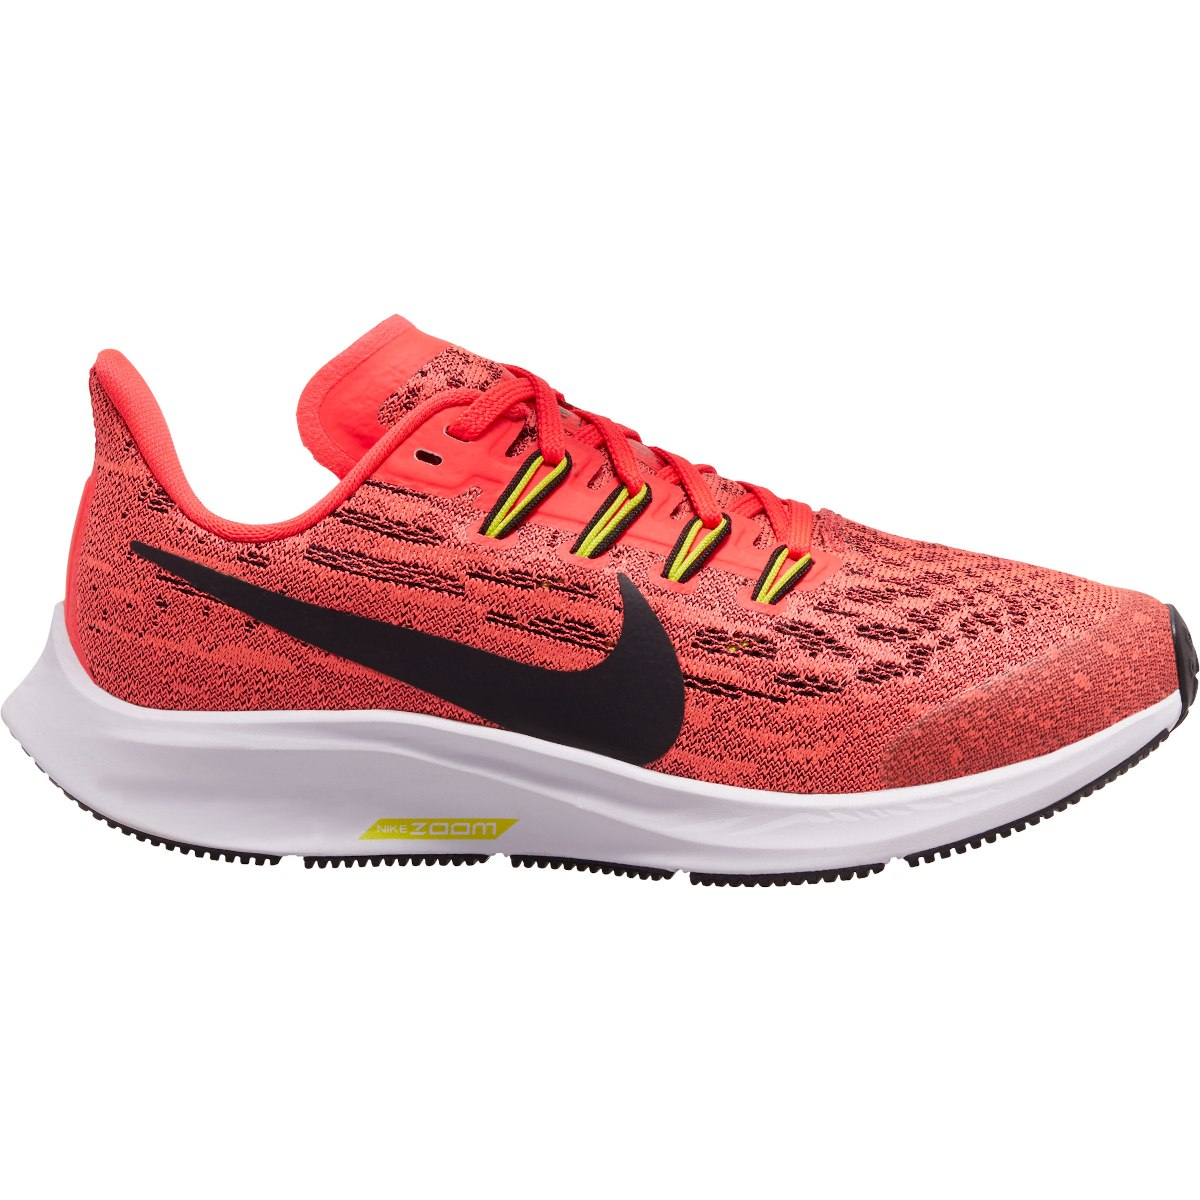 Nike Air Zoom Pegasus 36 Kids' Running Shoe - laser crimson/black-bright cactus-white AR4149-619